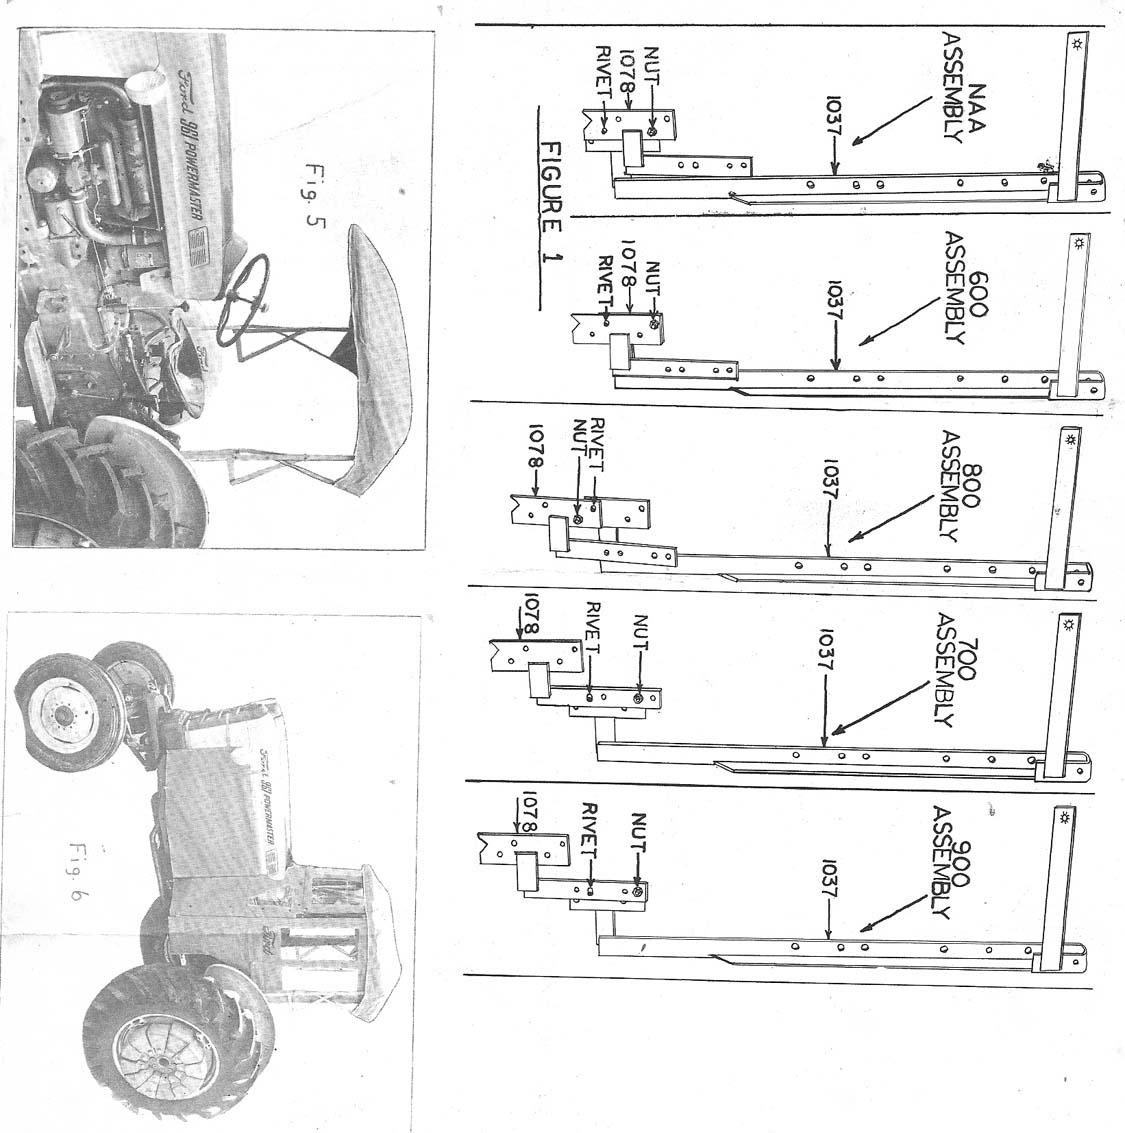 david brown 990 wiring diagram vivresaville trailer hitch 5 pin for 885 tractor